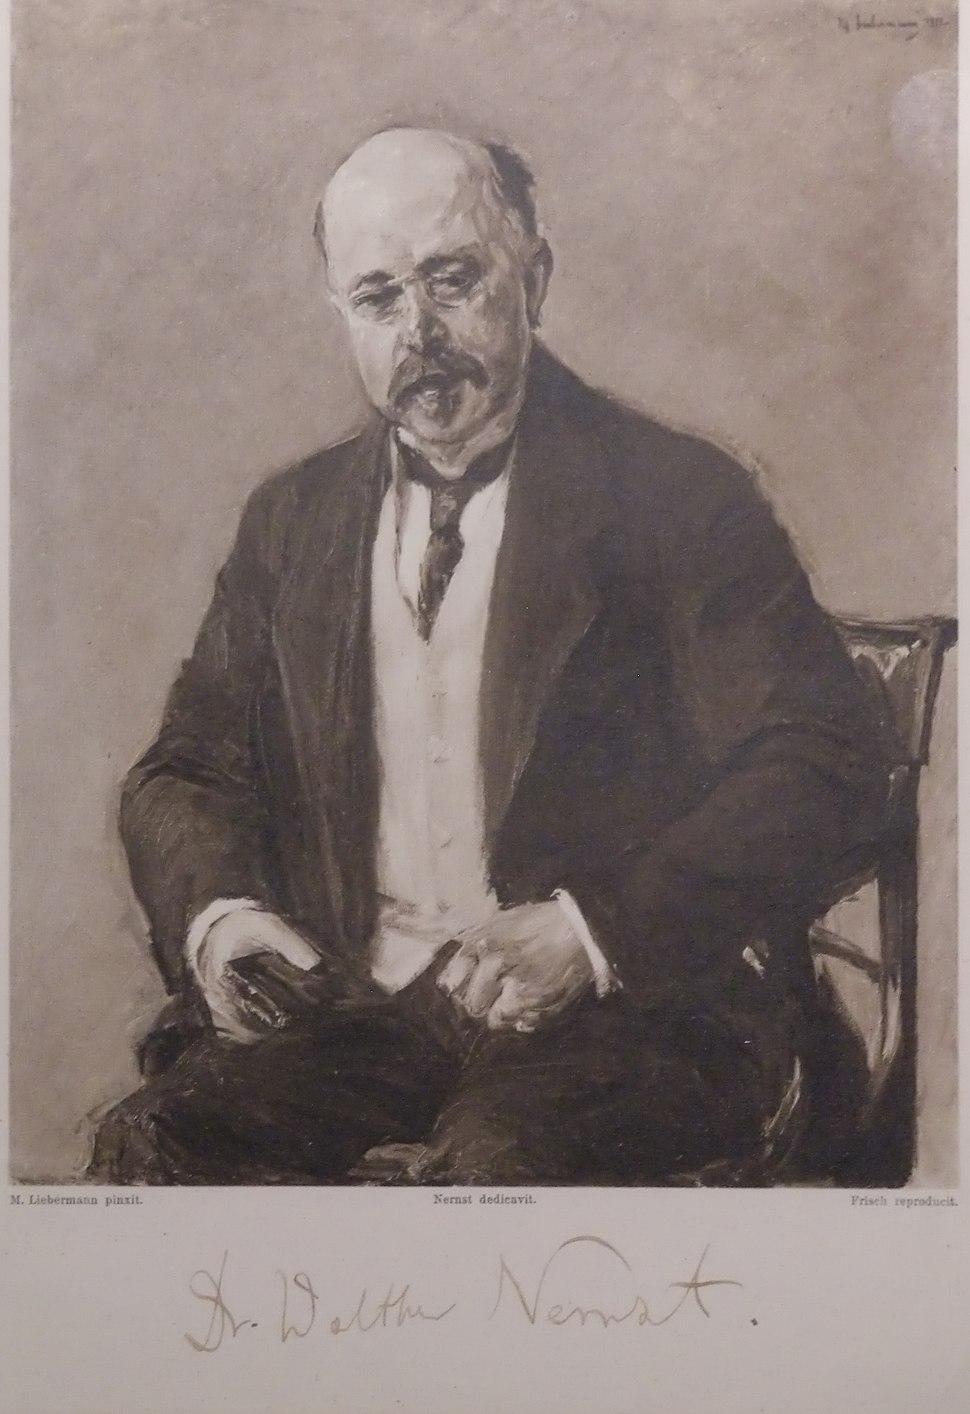 Nernst, Walther 1912